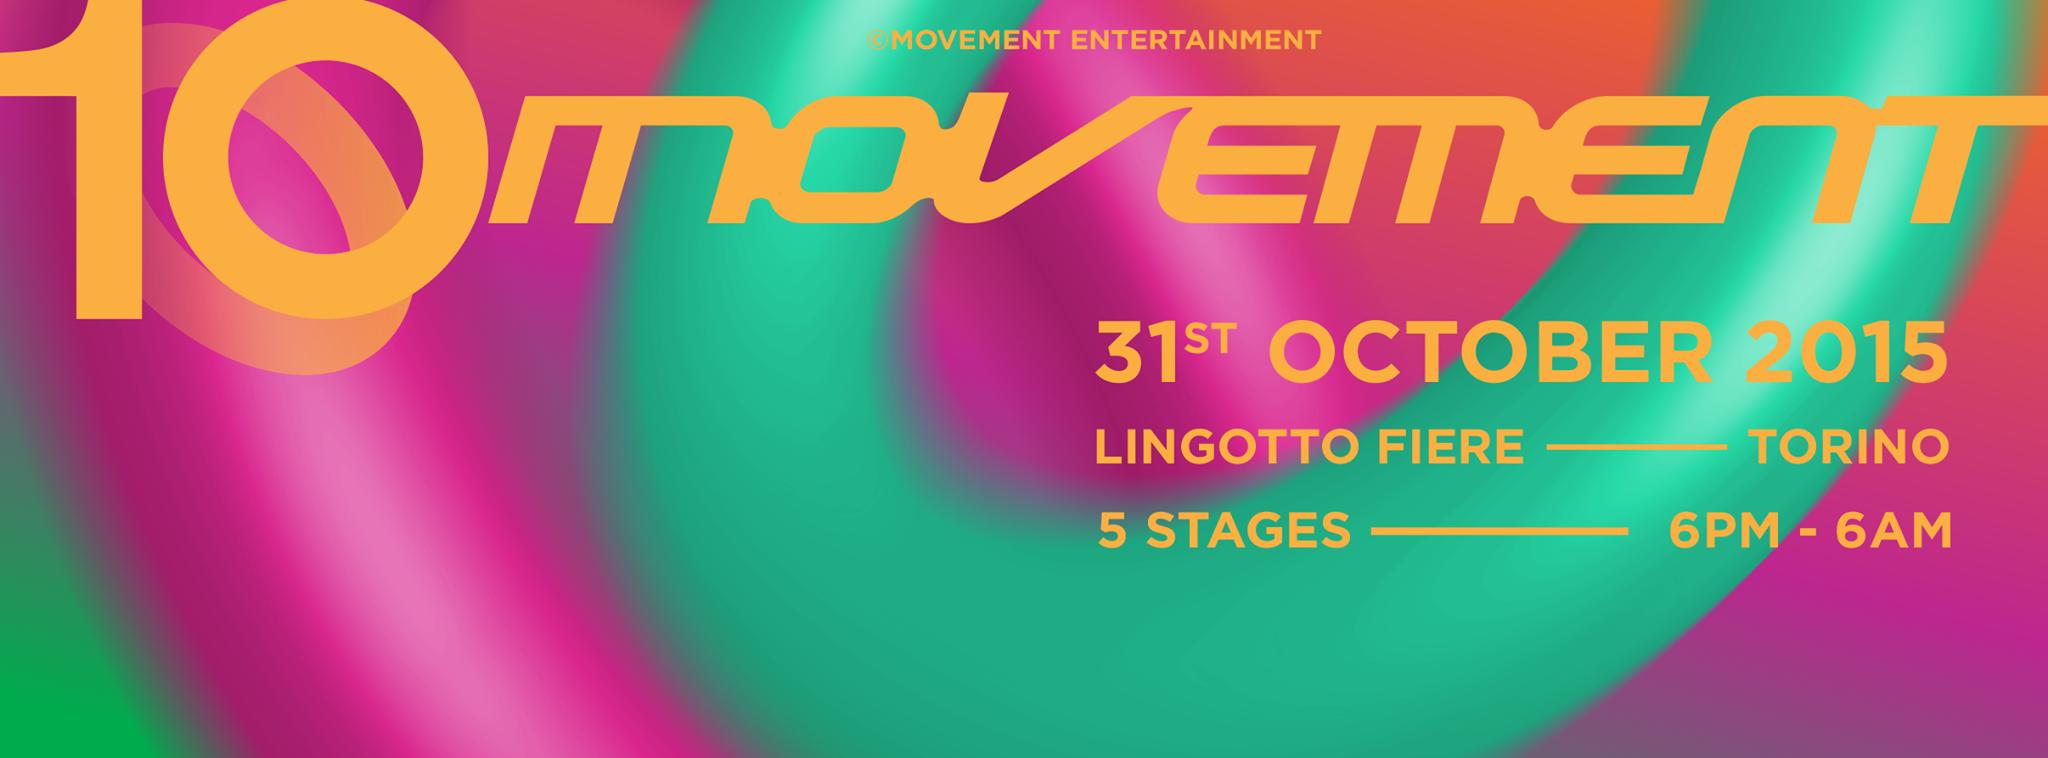 Movement Torino Music Festival 1